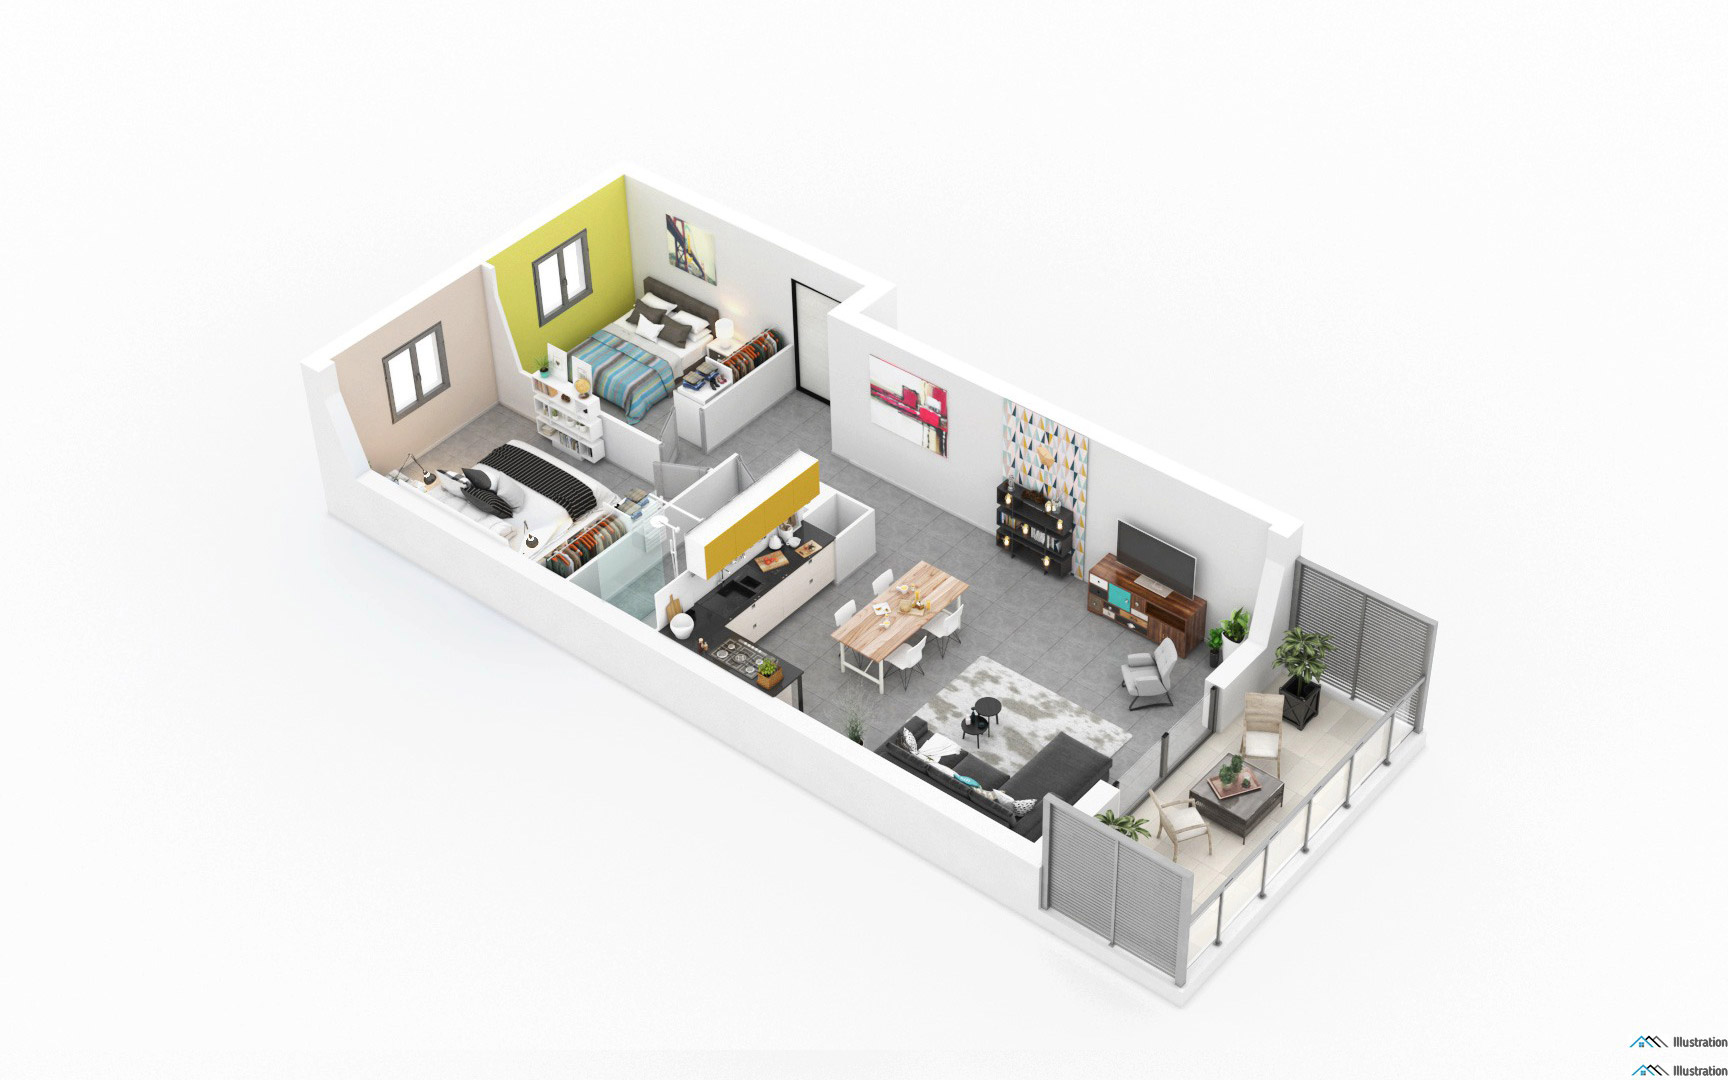 programme-neuf-a-maredda-milelli-route-alata-interieur-plan3D